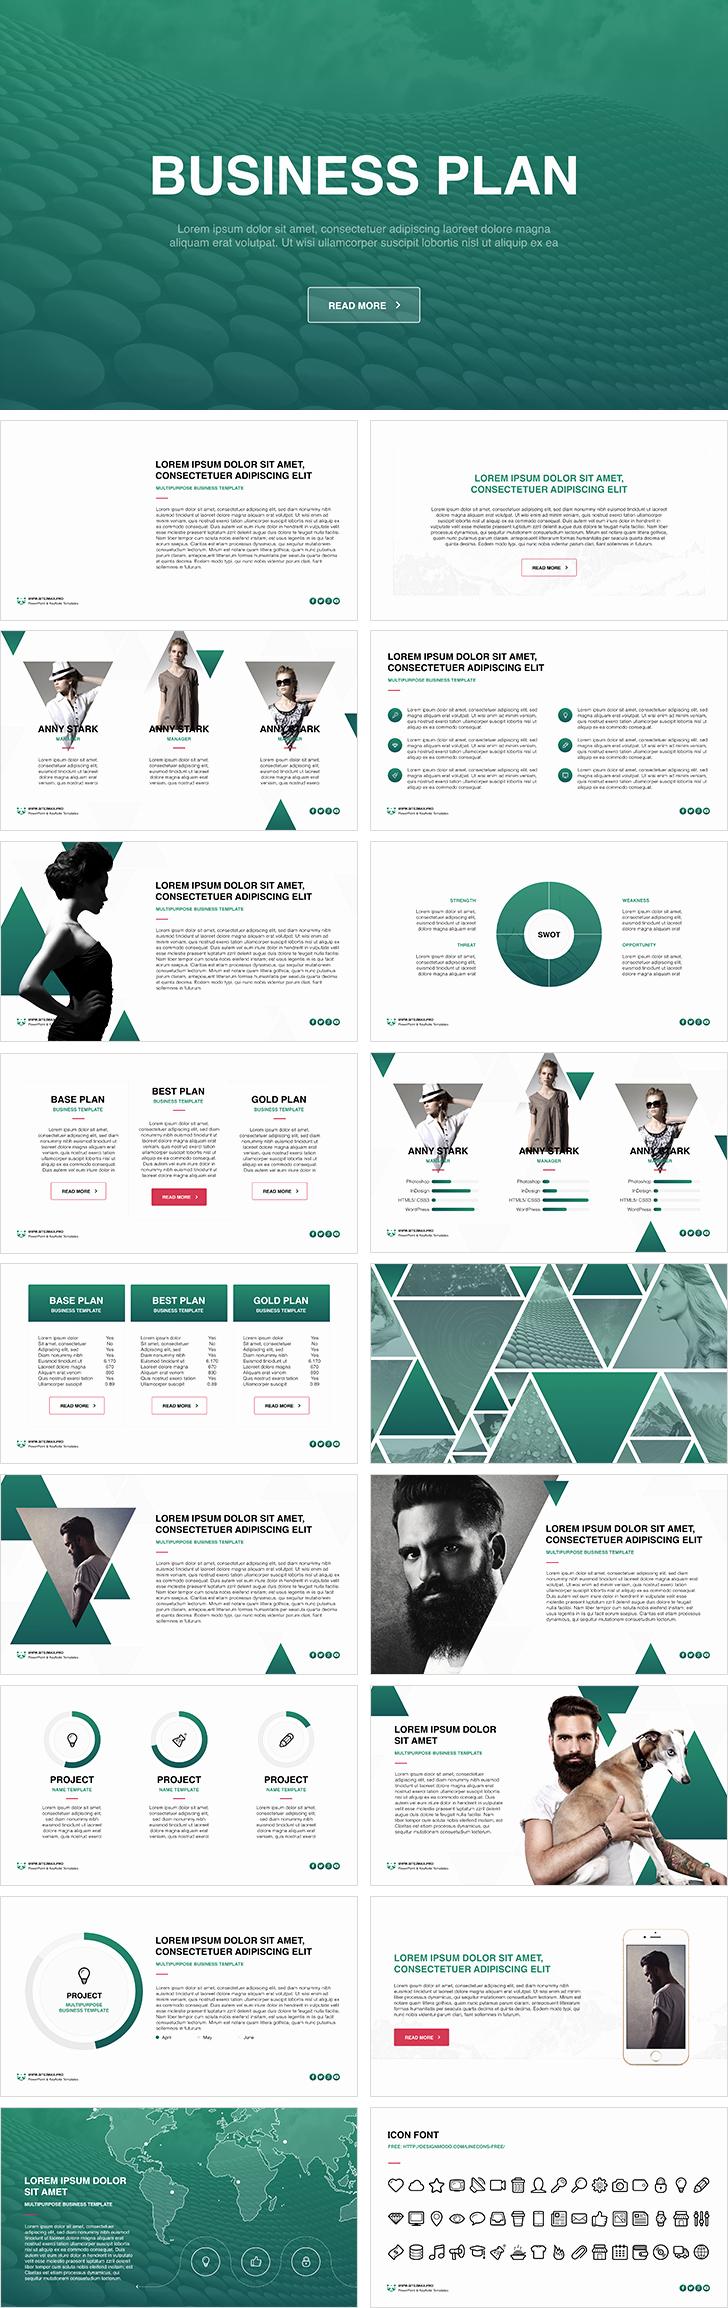 Business Plan Powerpoint Template Beautiful Business Plan Free Powerpoint Template Download Free